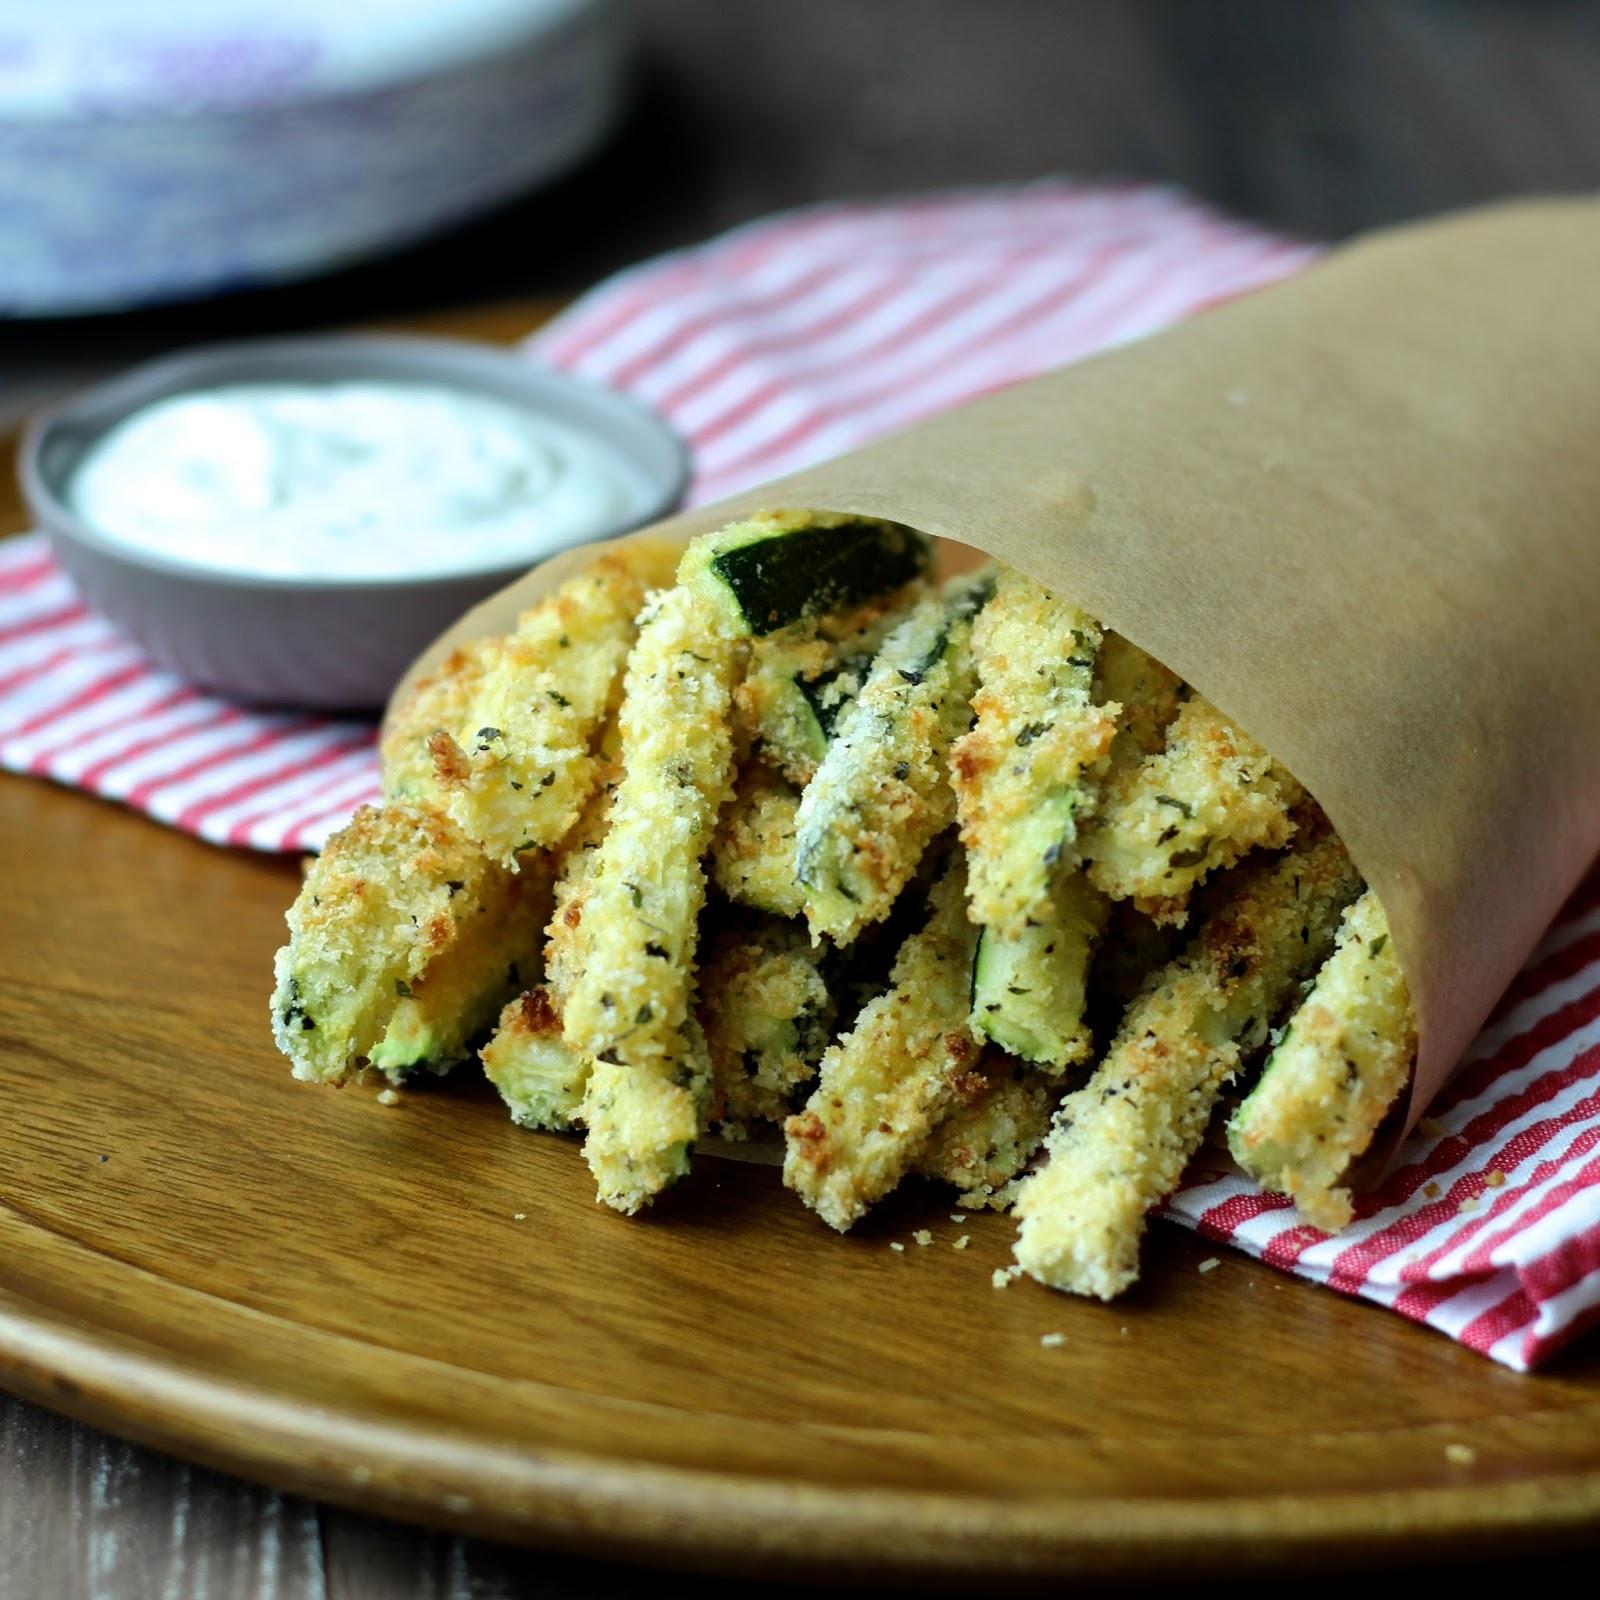 Cooking with SiennaCrispy Baked Zucchini FriesThe Foodie